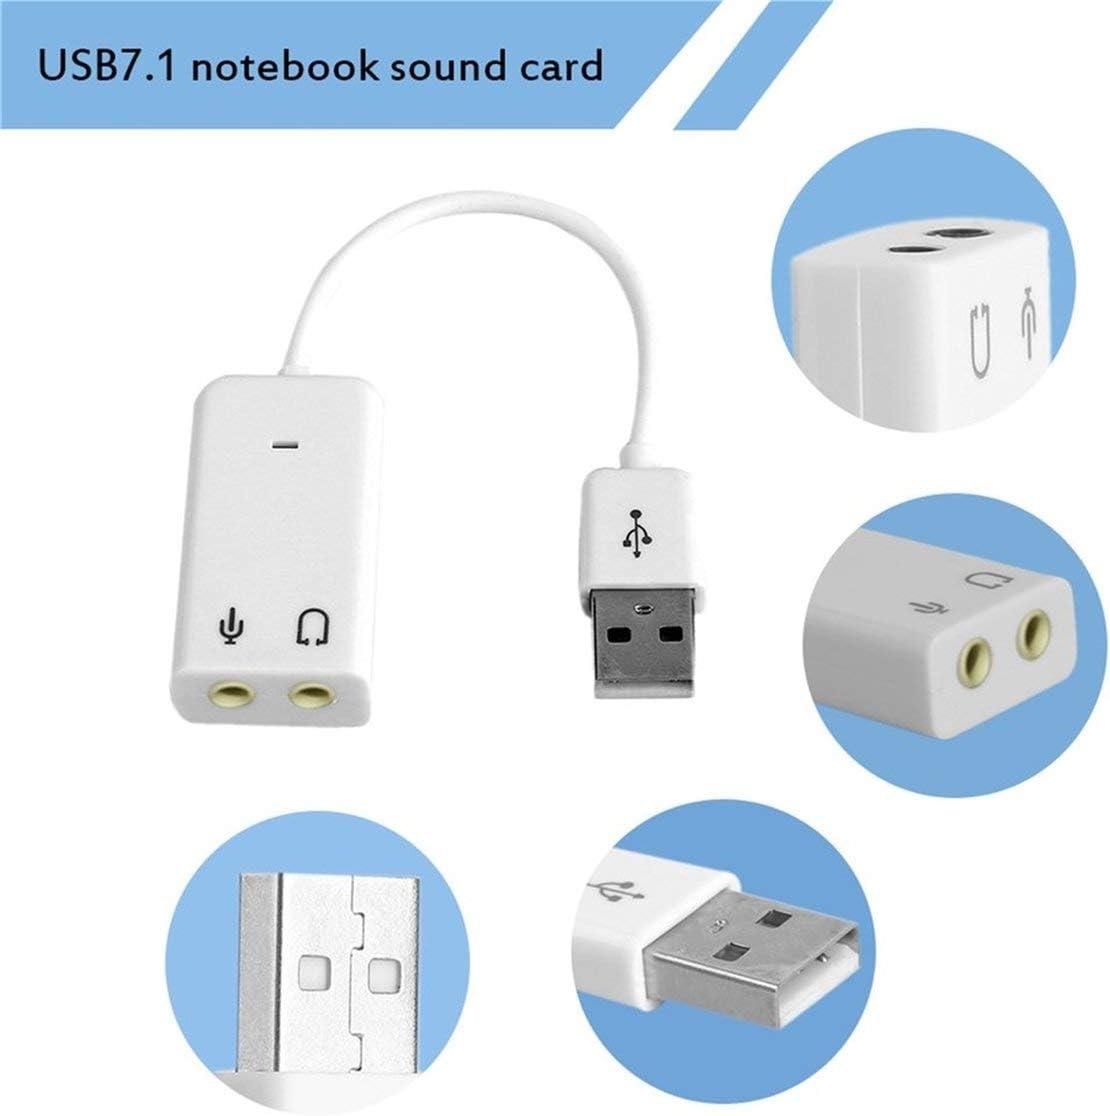 Kongqiabona USB-Soundkarte USB 7.1-Kanal-Externe Soundkarte mit unabh/ängiger externer Soundkarte